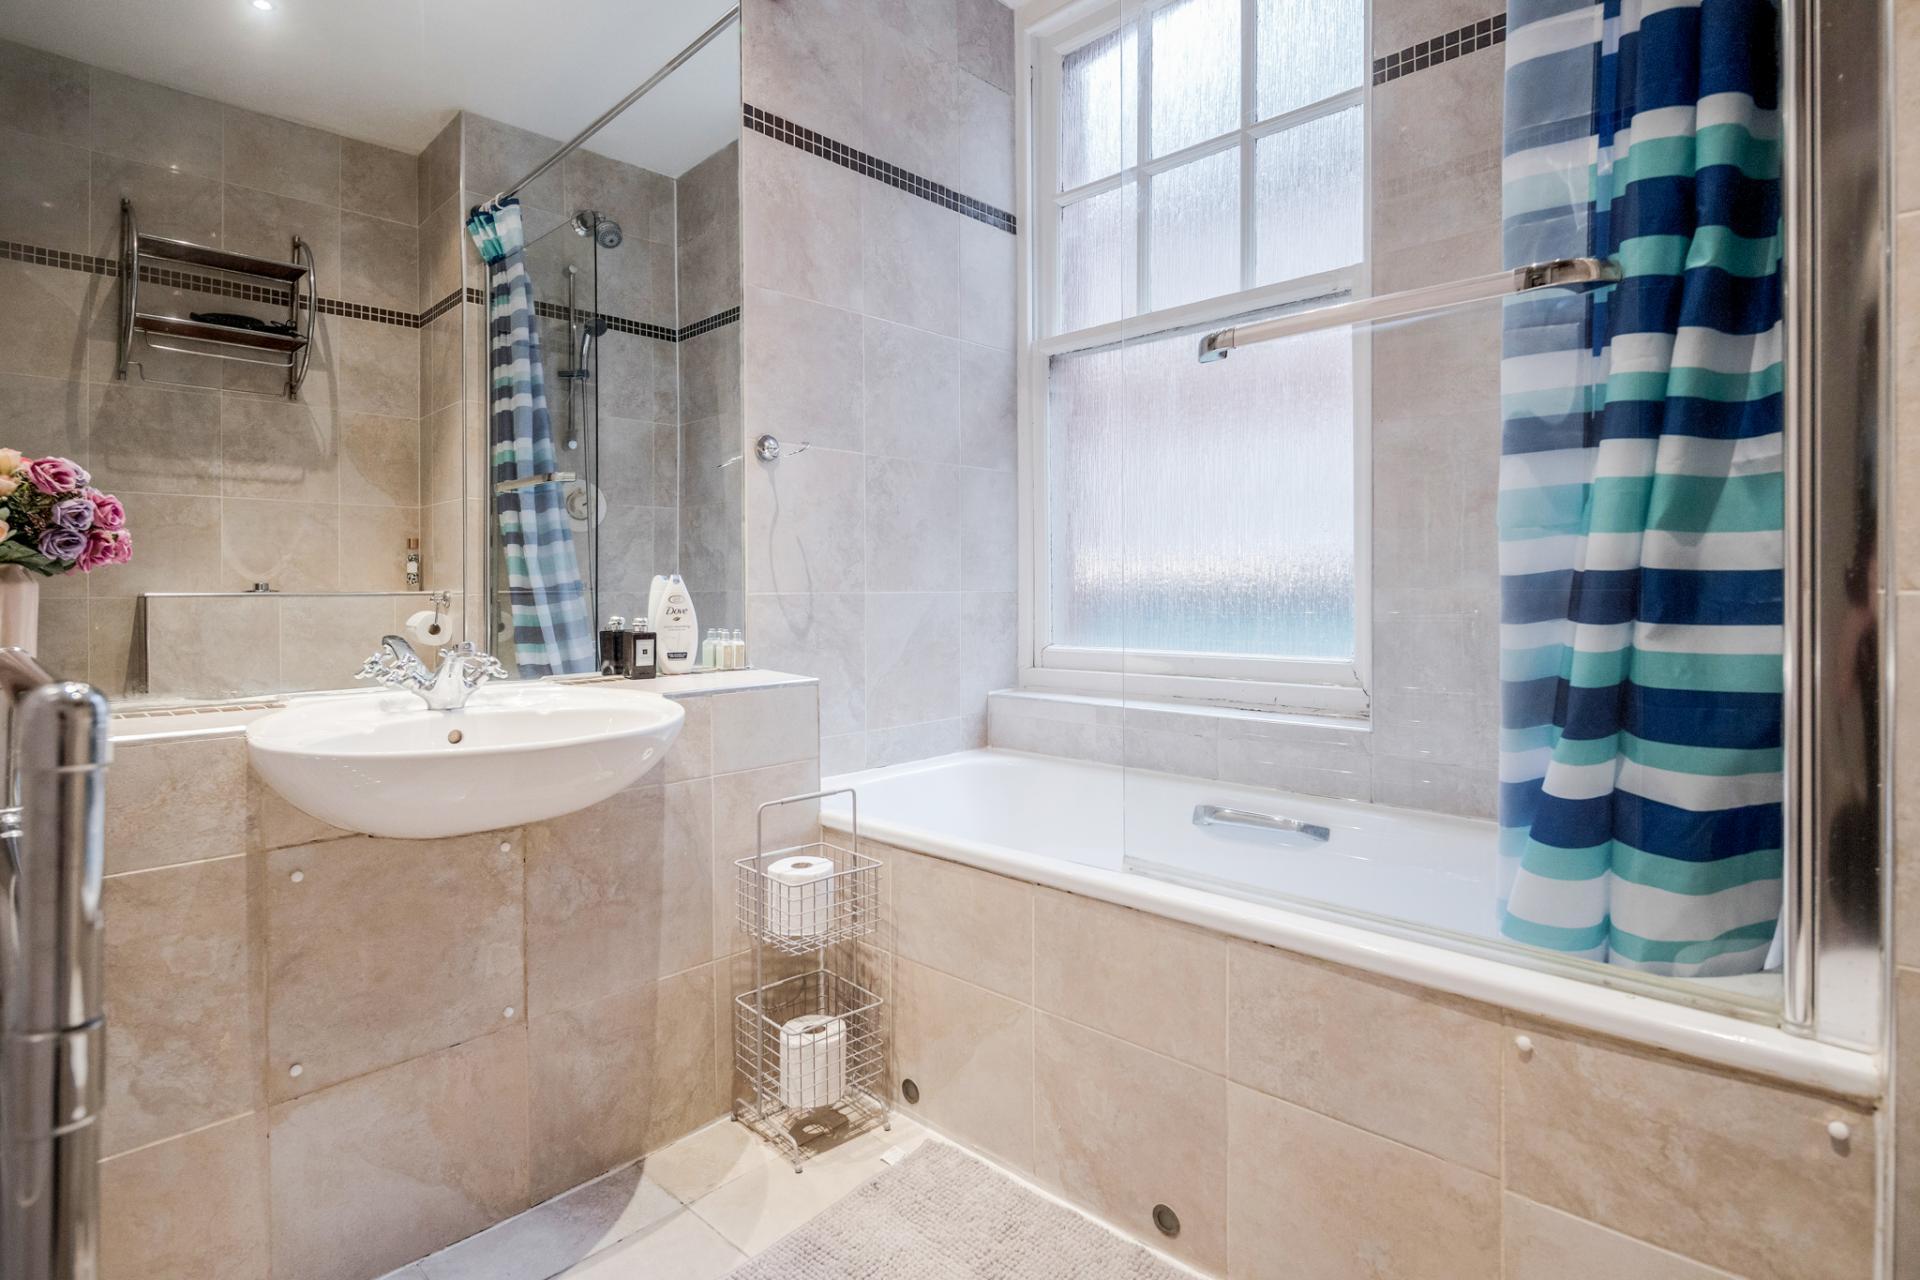 Bathroom at Kensington High Street, Kensington, London - Citybase Apartments